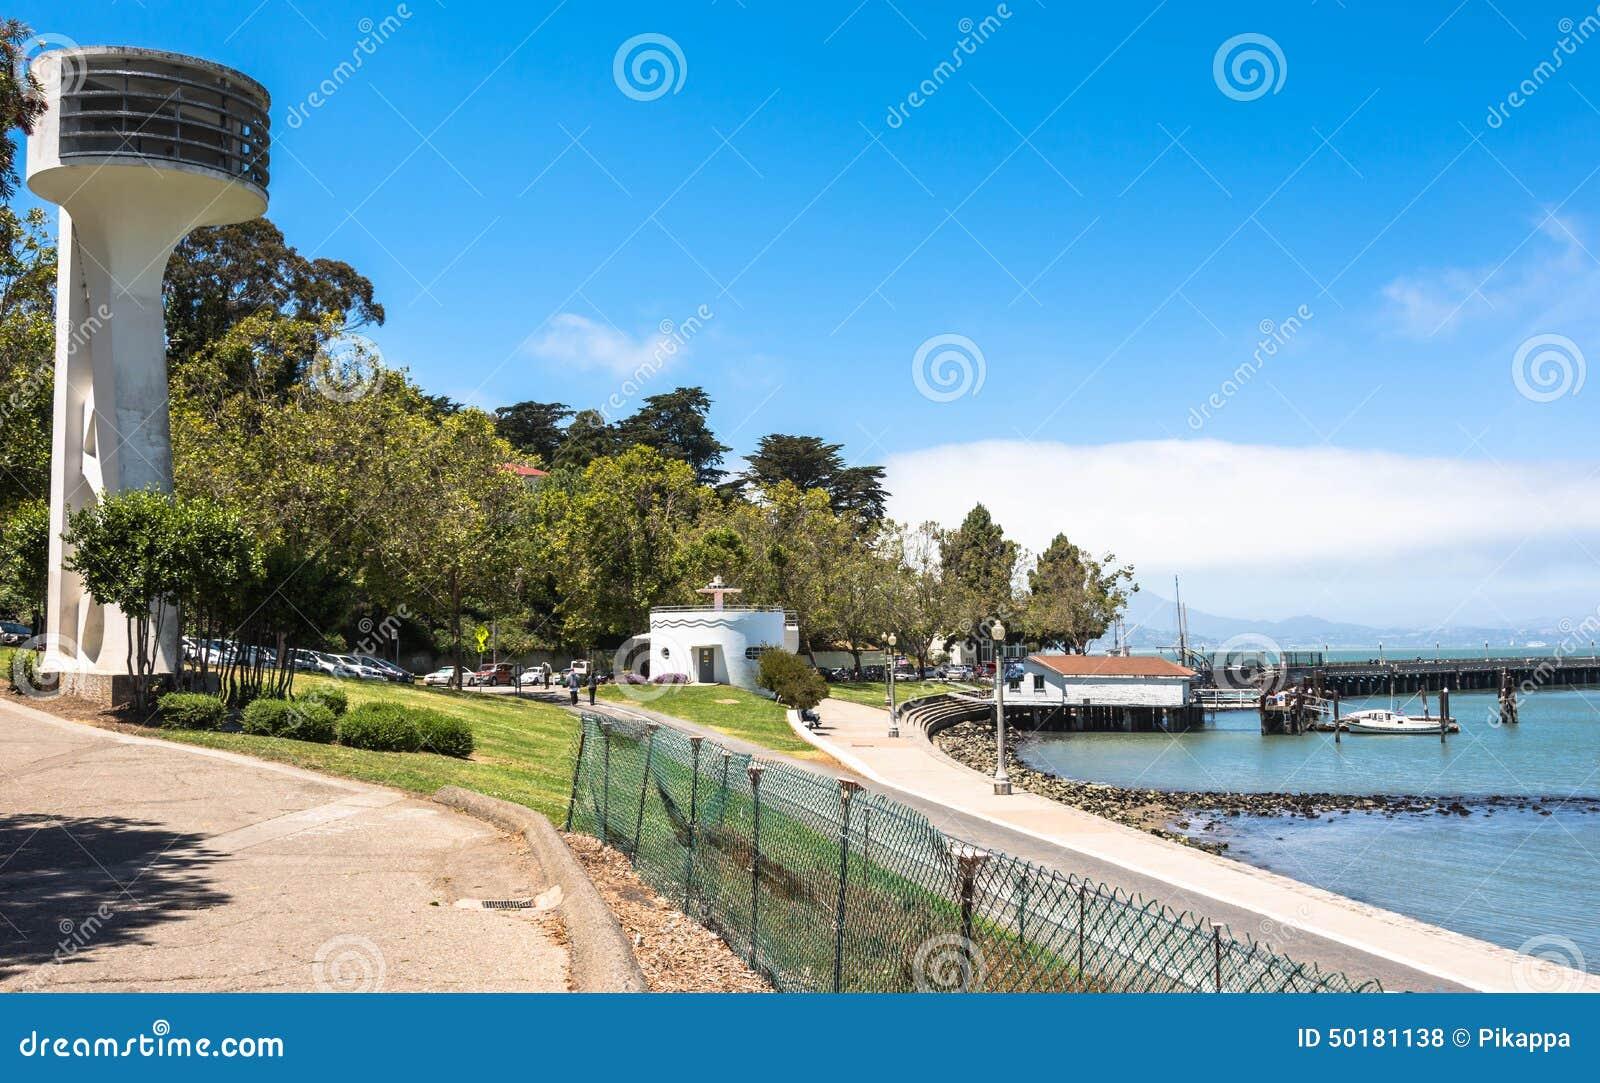 Parco acquatico a San Francisco